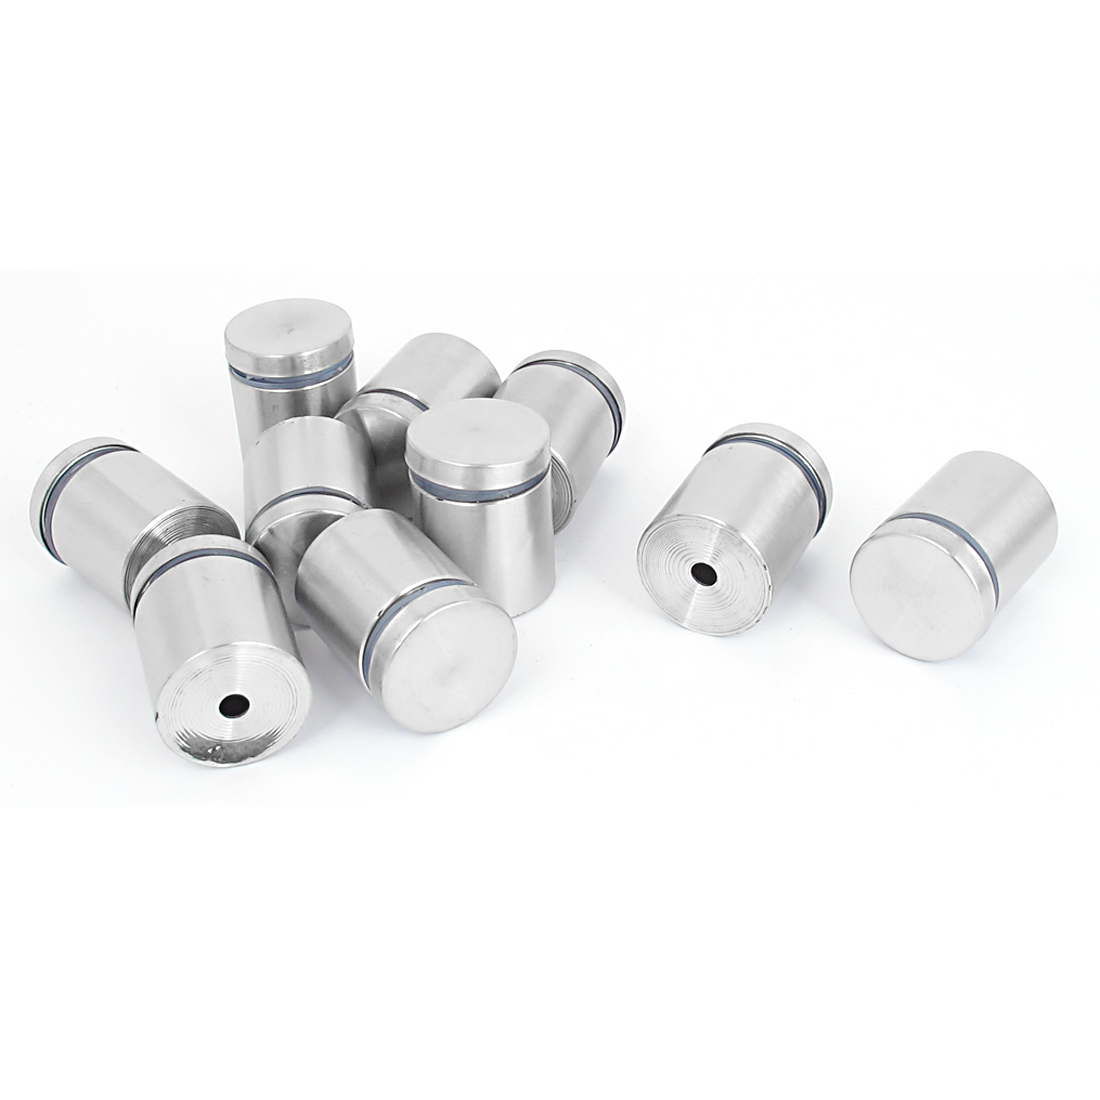 25mm x 30mm Stainless Steel Advertising Frameless Glass Standoff Pins 10pcs